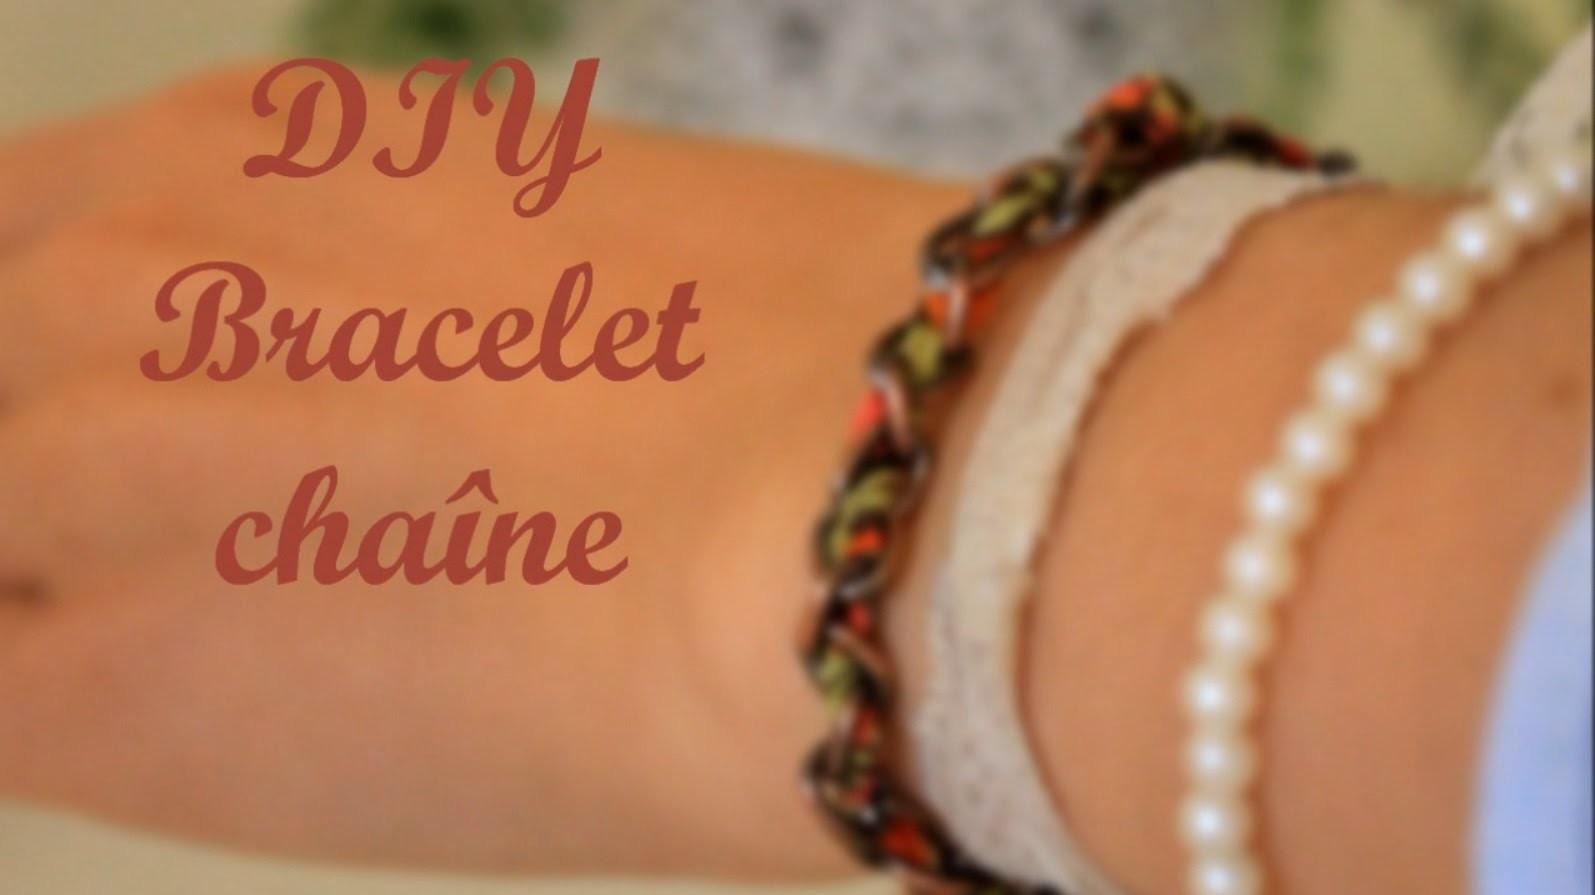 DIY - Bracelet chaîne